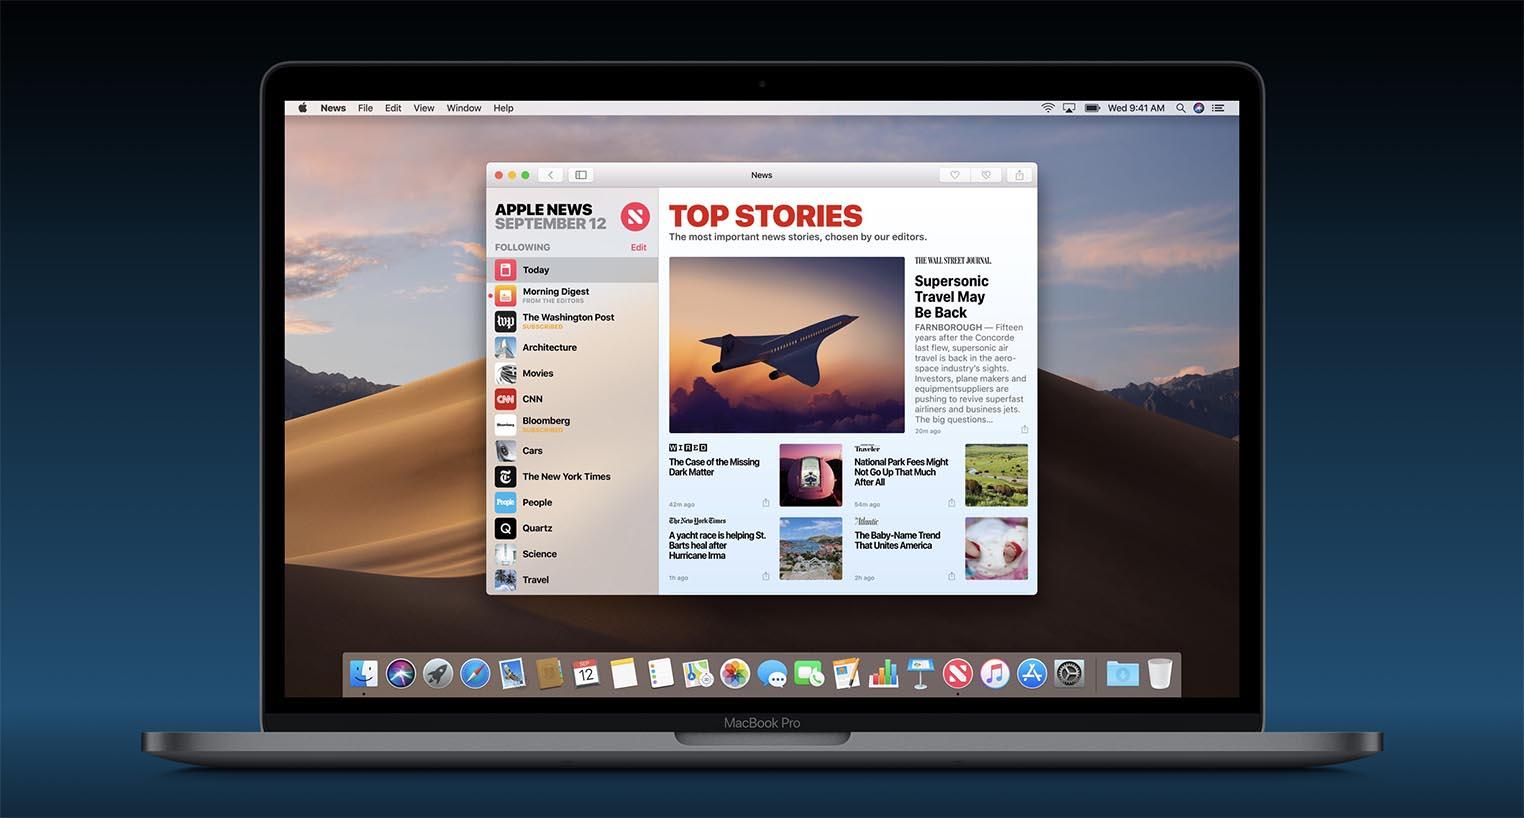 Apple News macOS Mojave